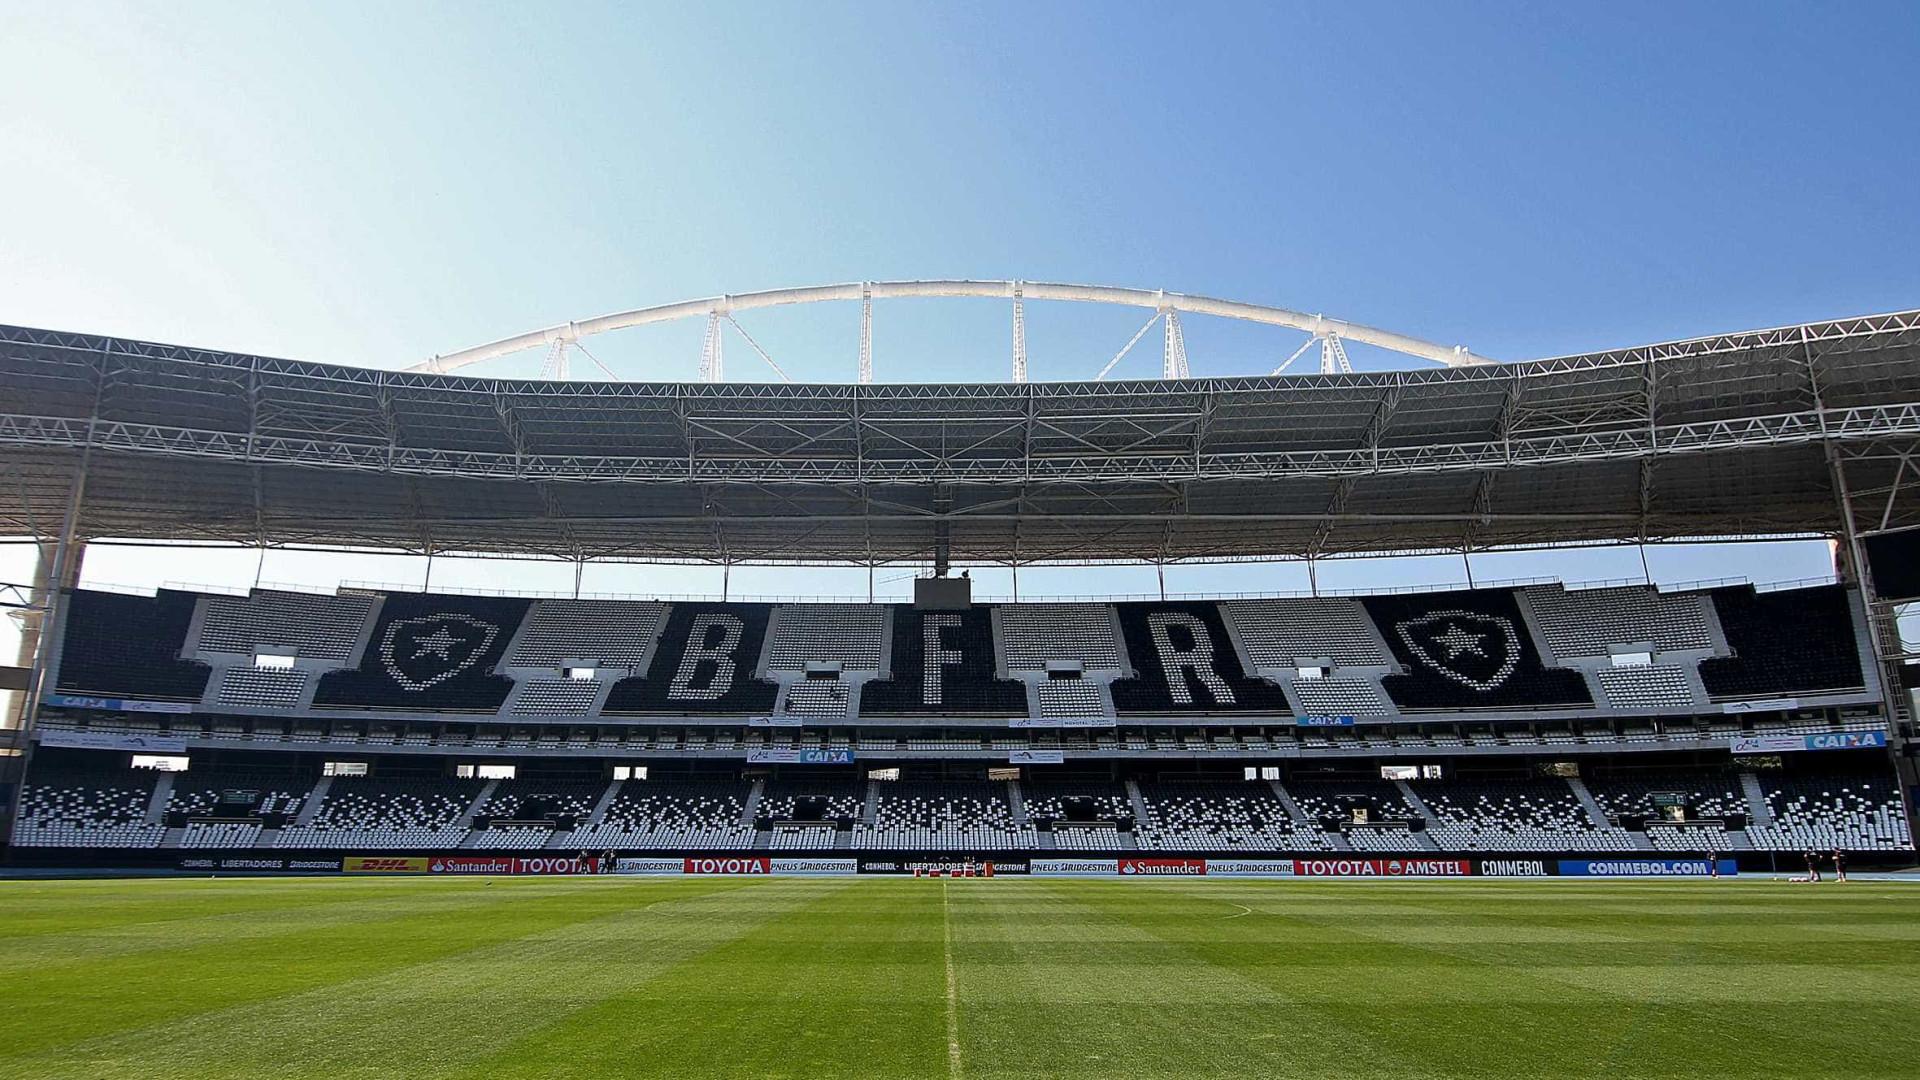 Rodada desta quinta tem jogos decisivos na Libertadores; confira